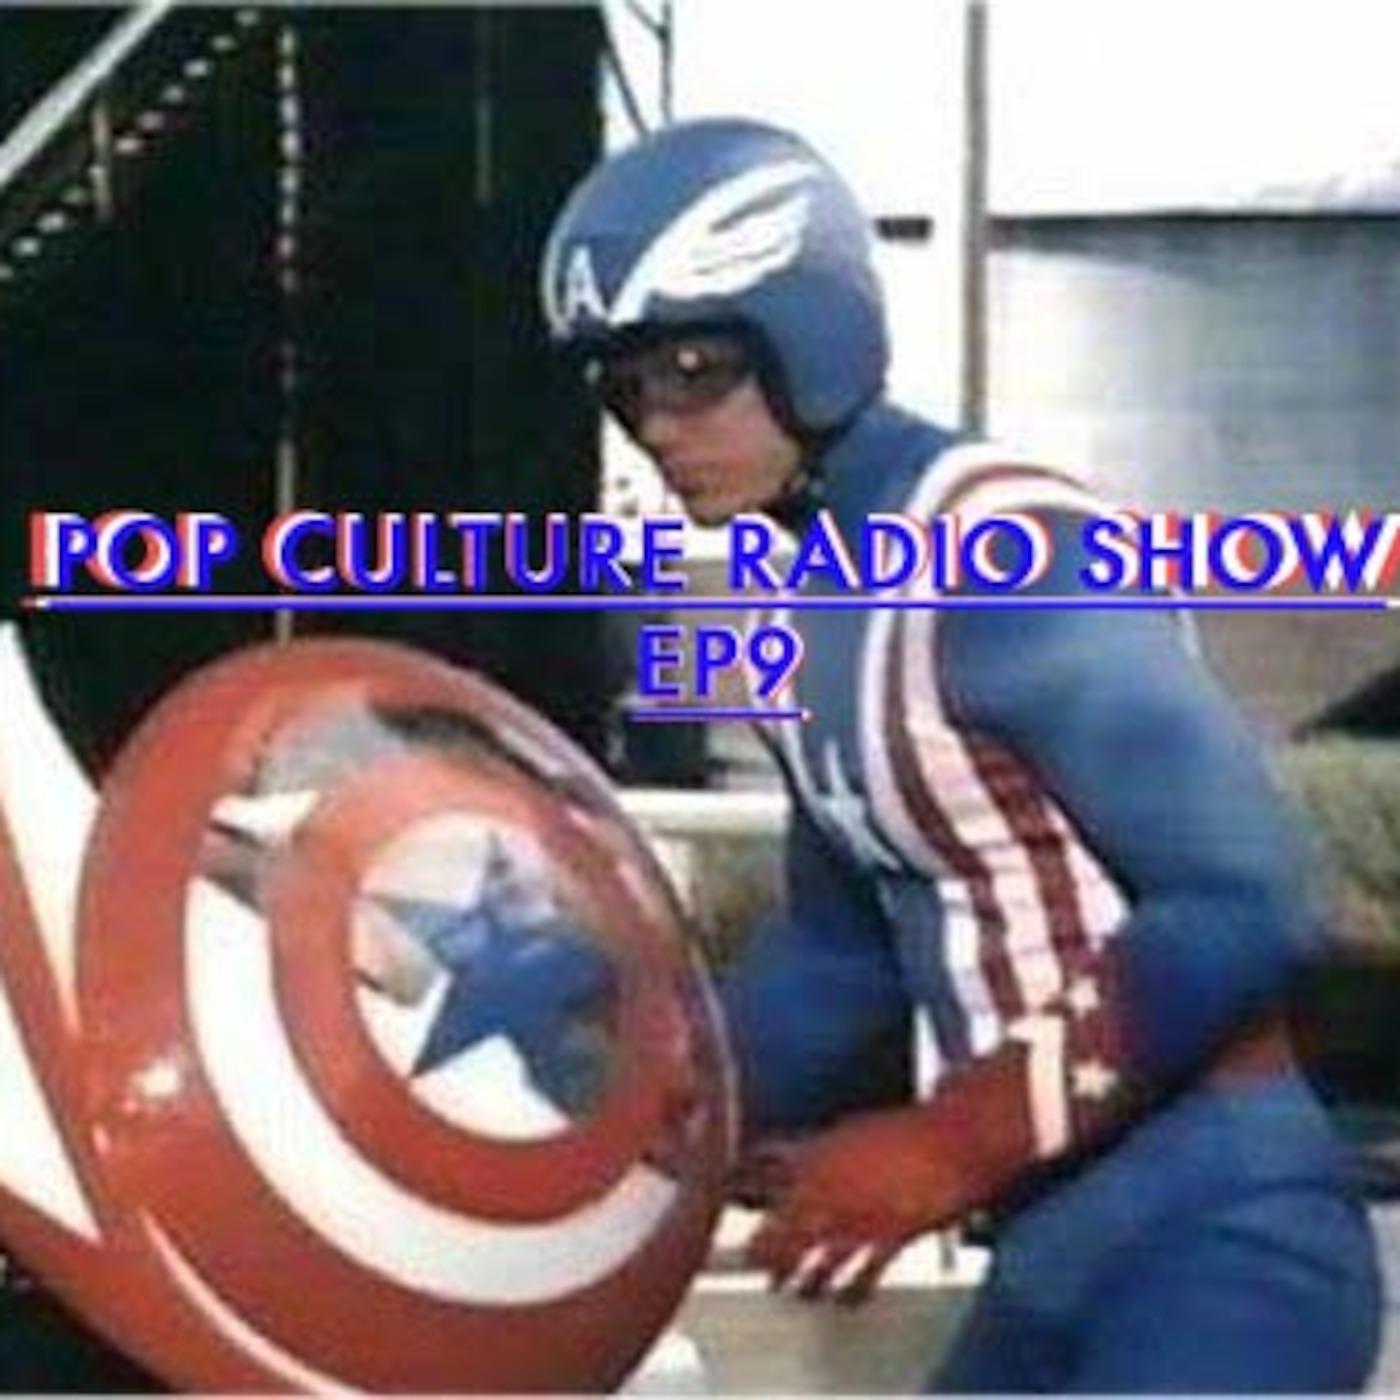 Pop Culture Radio Show